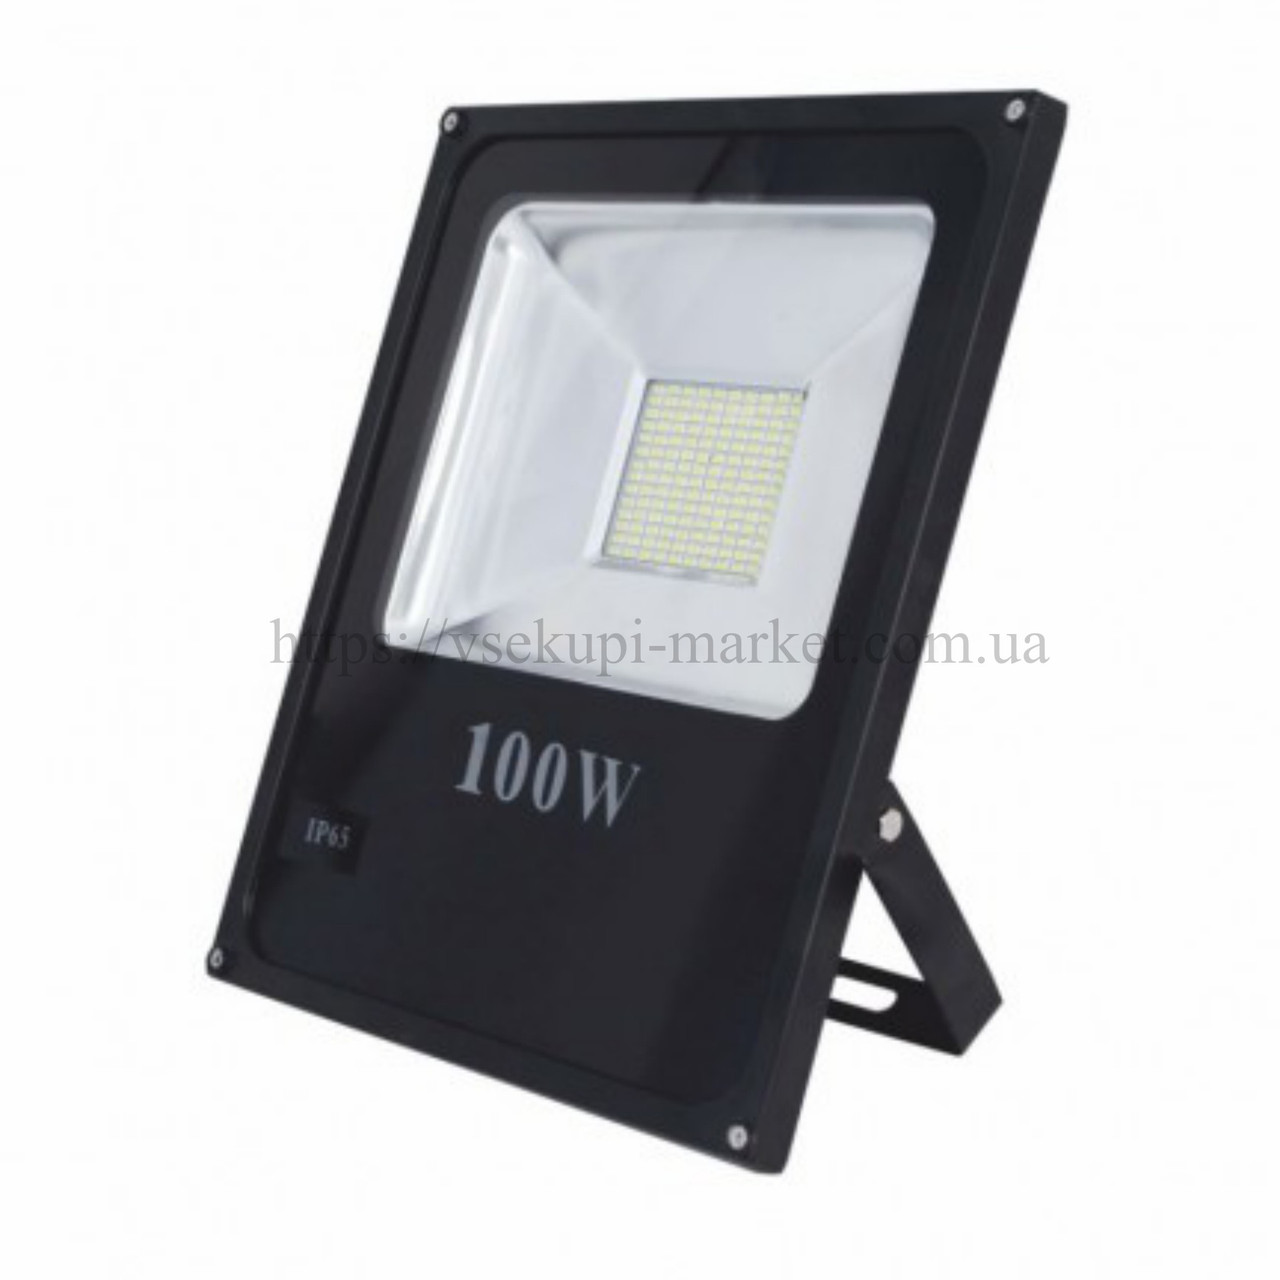 Прожектор RIGHT HAUSEN STANDARD LED 100W 6500K IP65 черный HN-191252